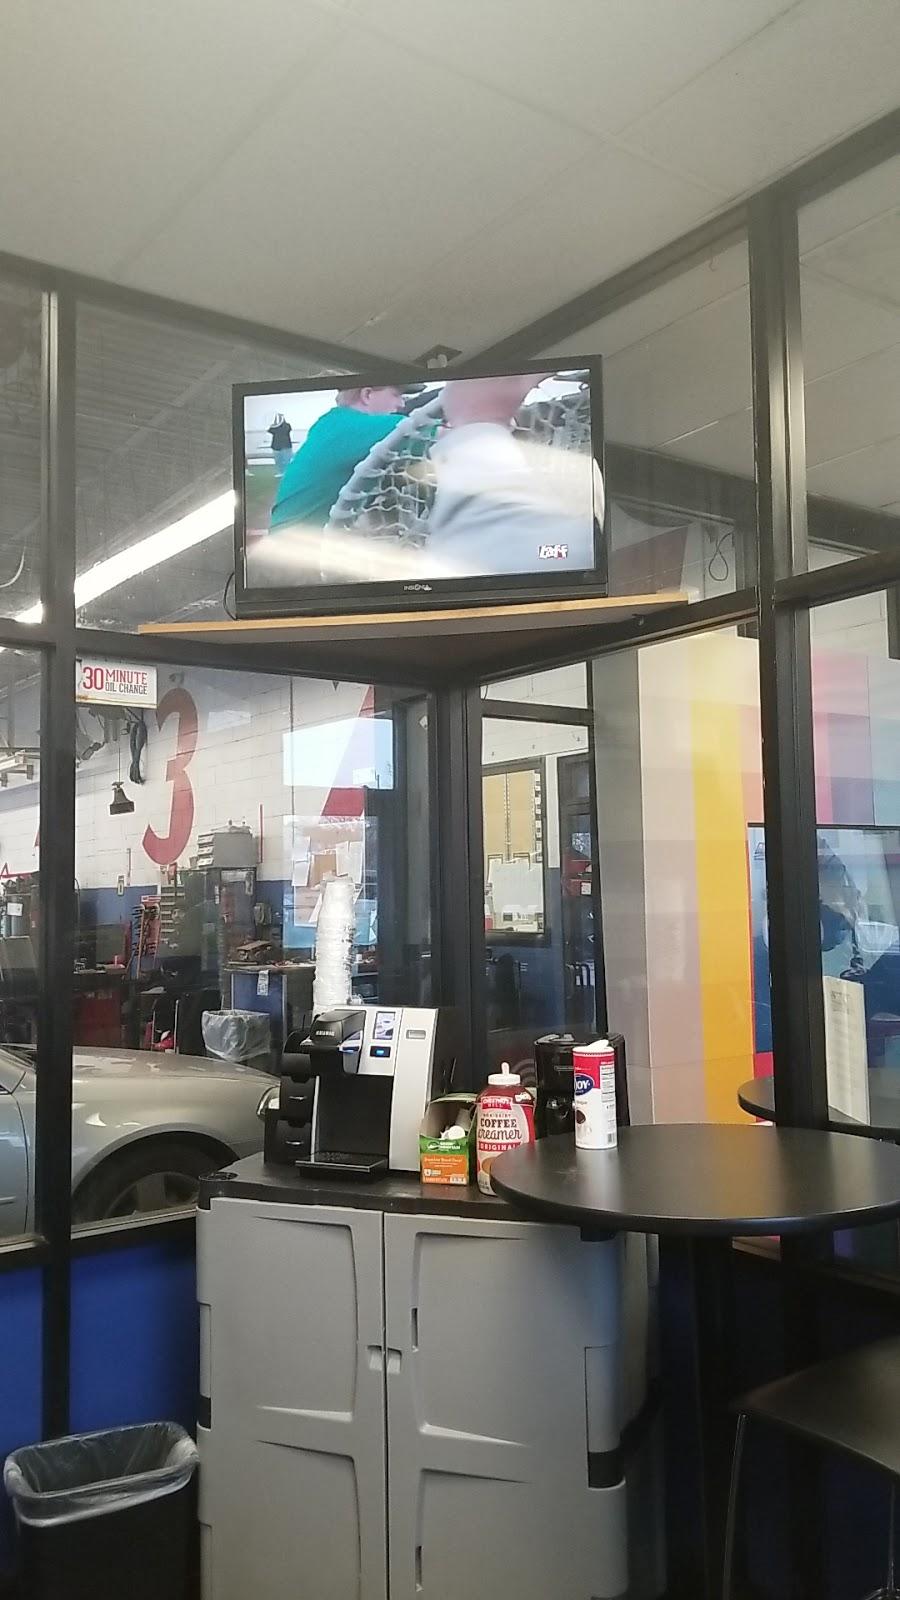 Pep Boys - car repair    Photo 5 of 10   Address: 5000 GA-138, Union City, GA 30291, USA   Phone: (770) 964-0071